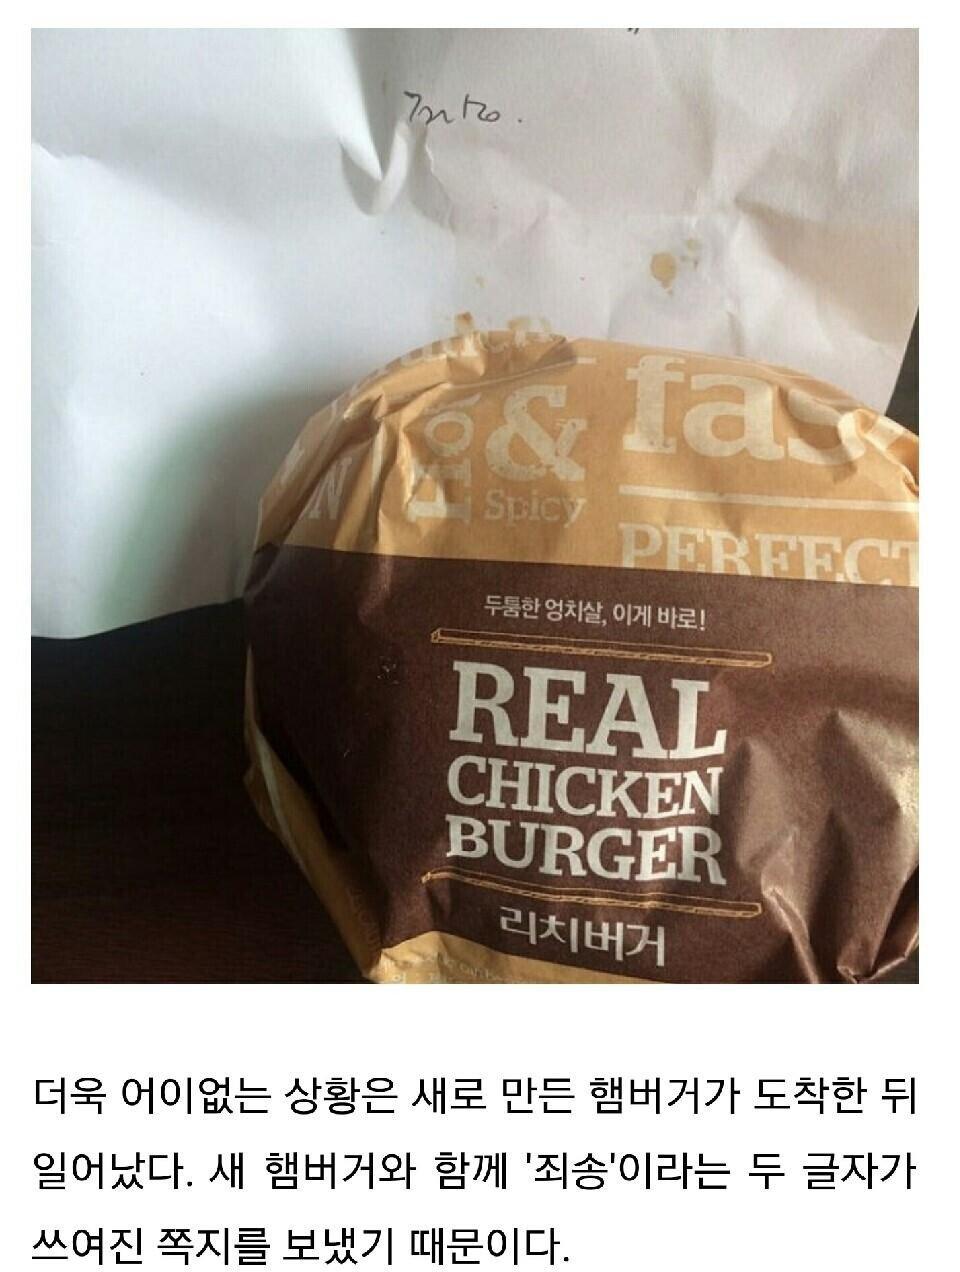 15b3c5bc04a18ffd4.jpg 햄버거에 닭뼈나온 롯데리아 답변.jpg